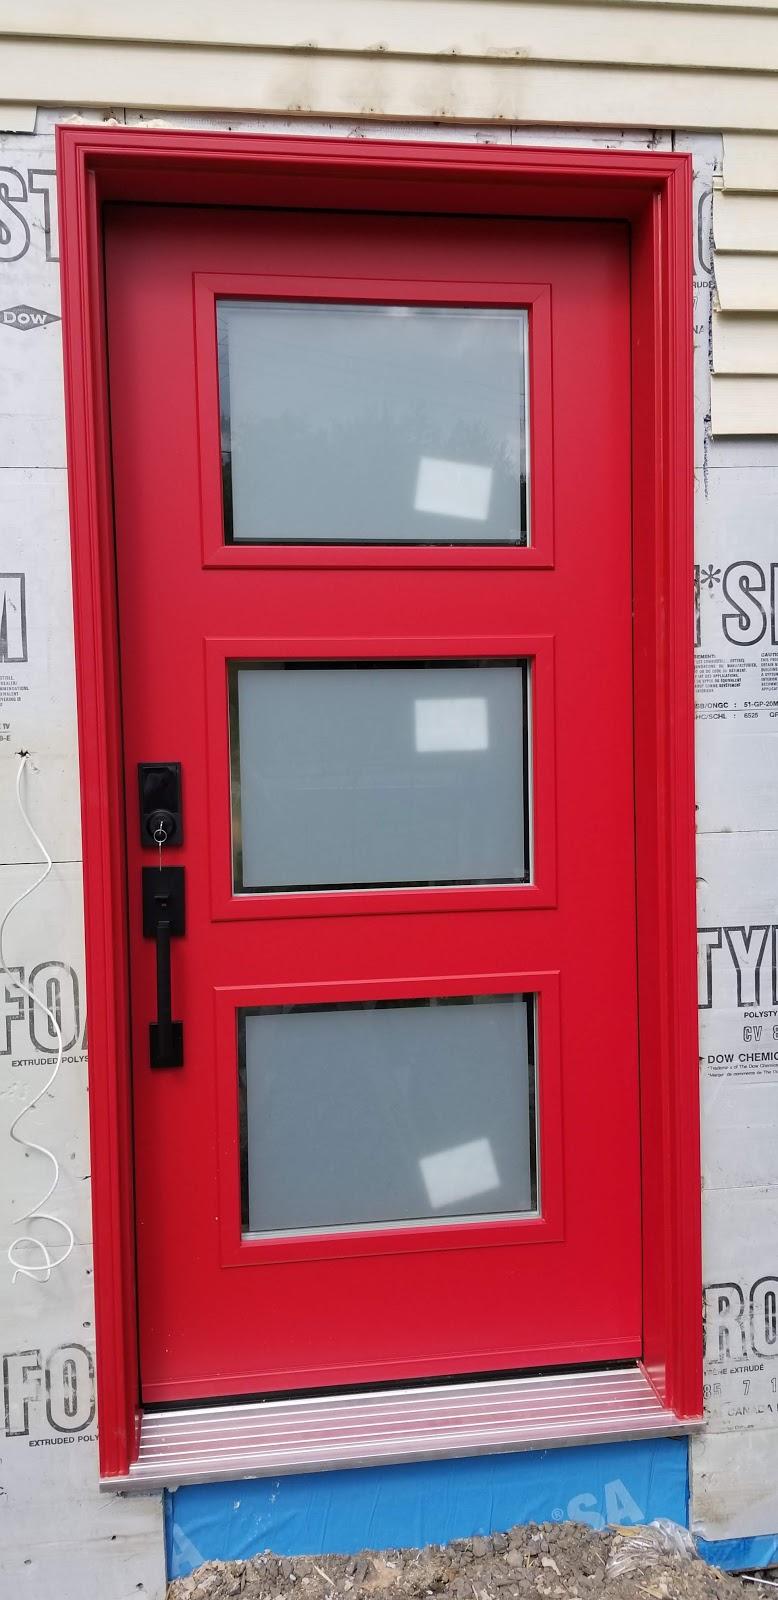 Northern Lights & Doors Inc   home goods store   7956 Torbram Rd, Brampton, ON L6T 5A2, Canada   9057900118 OR +1 905-790-0118